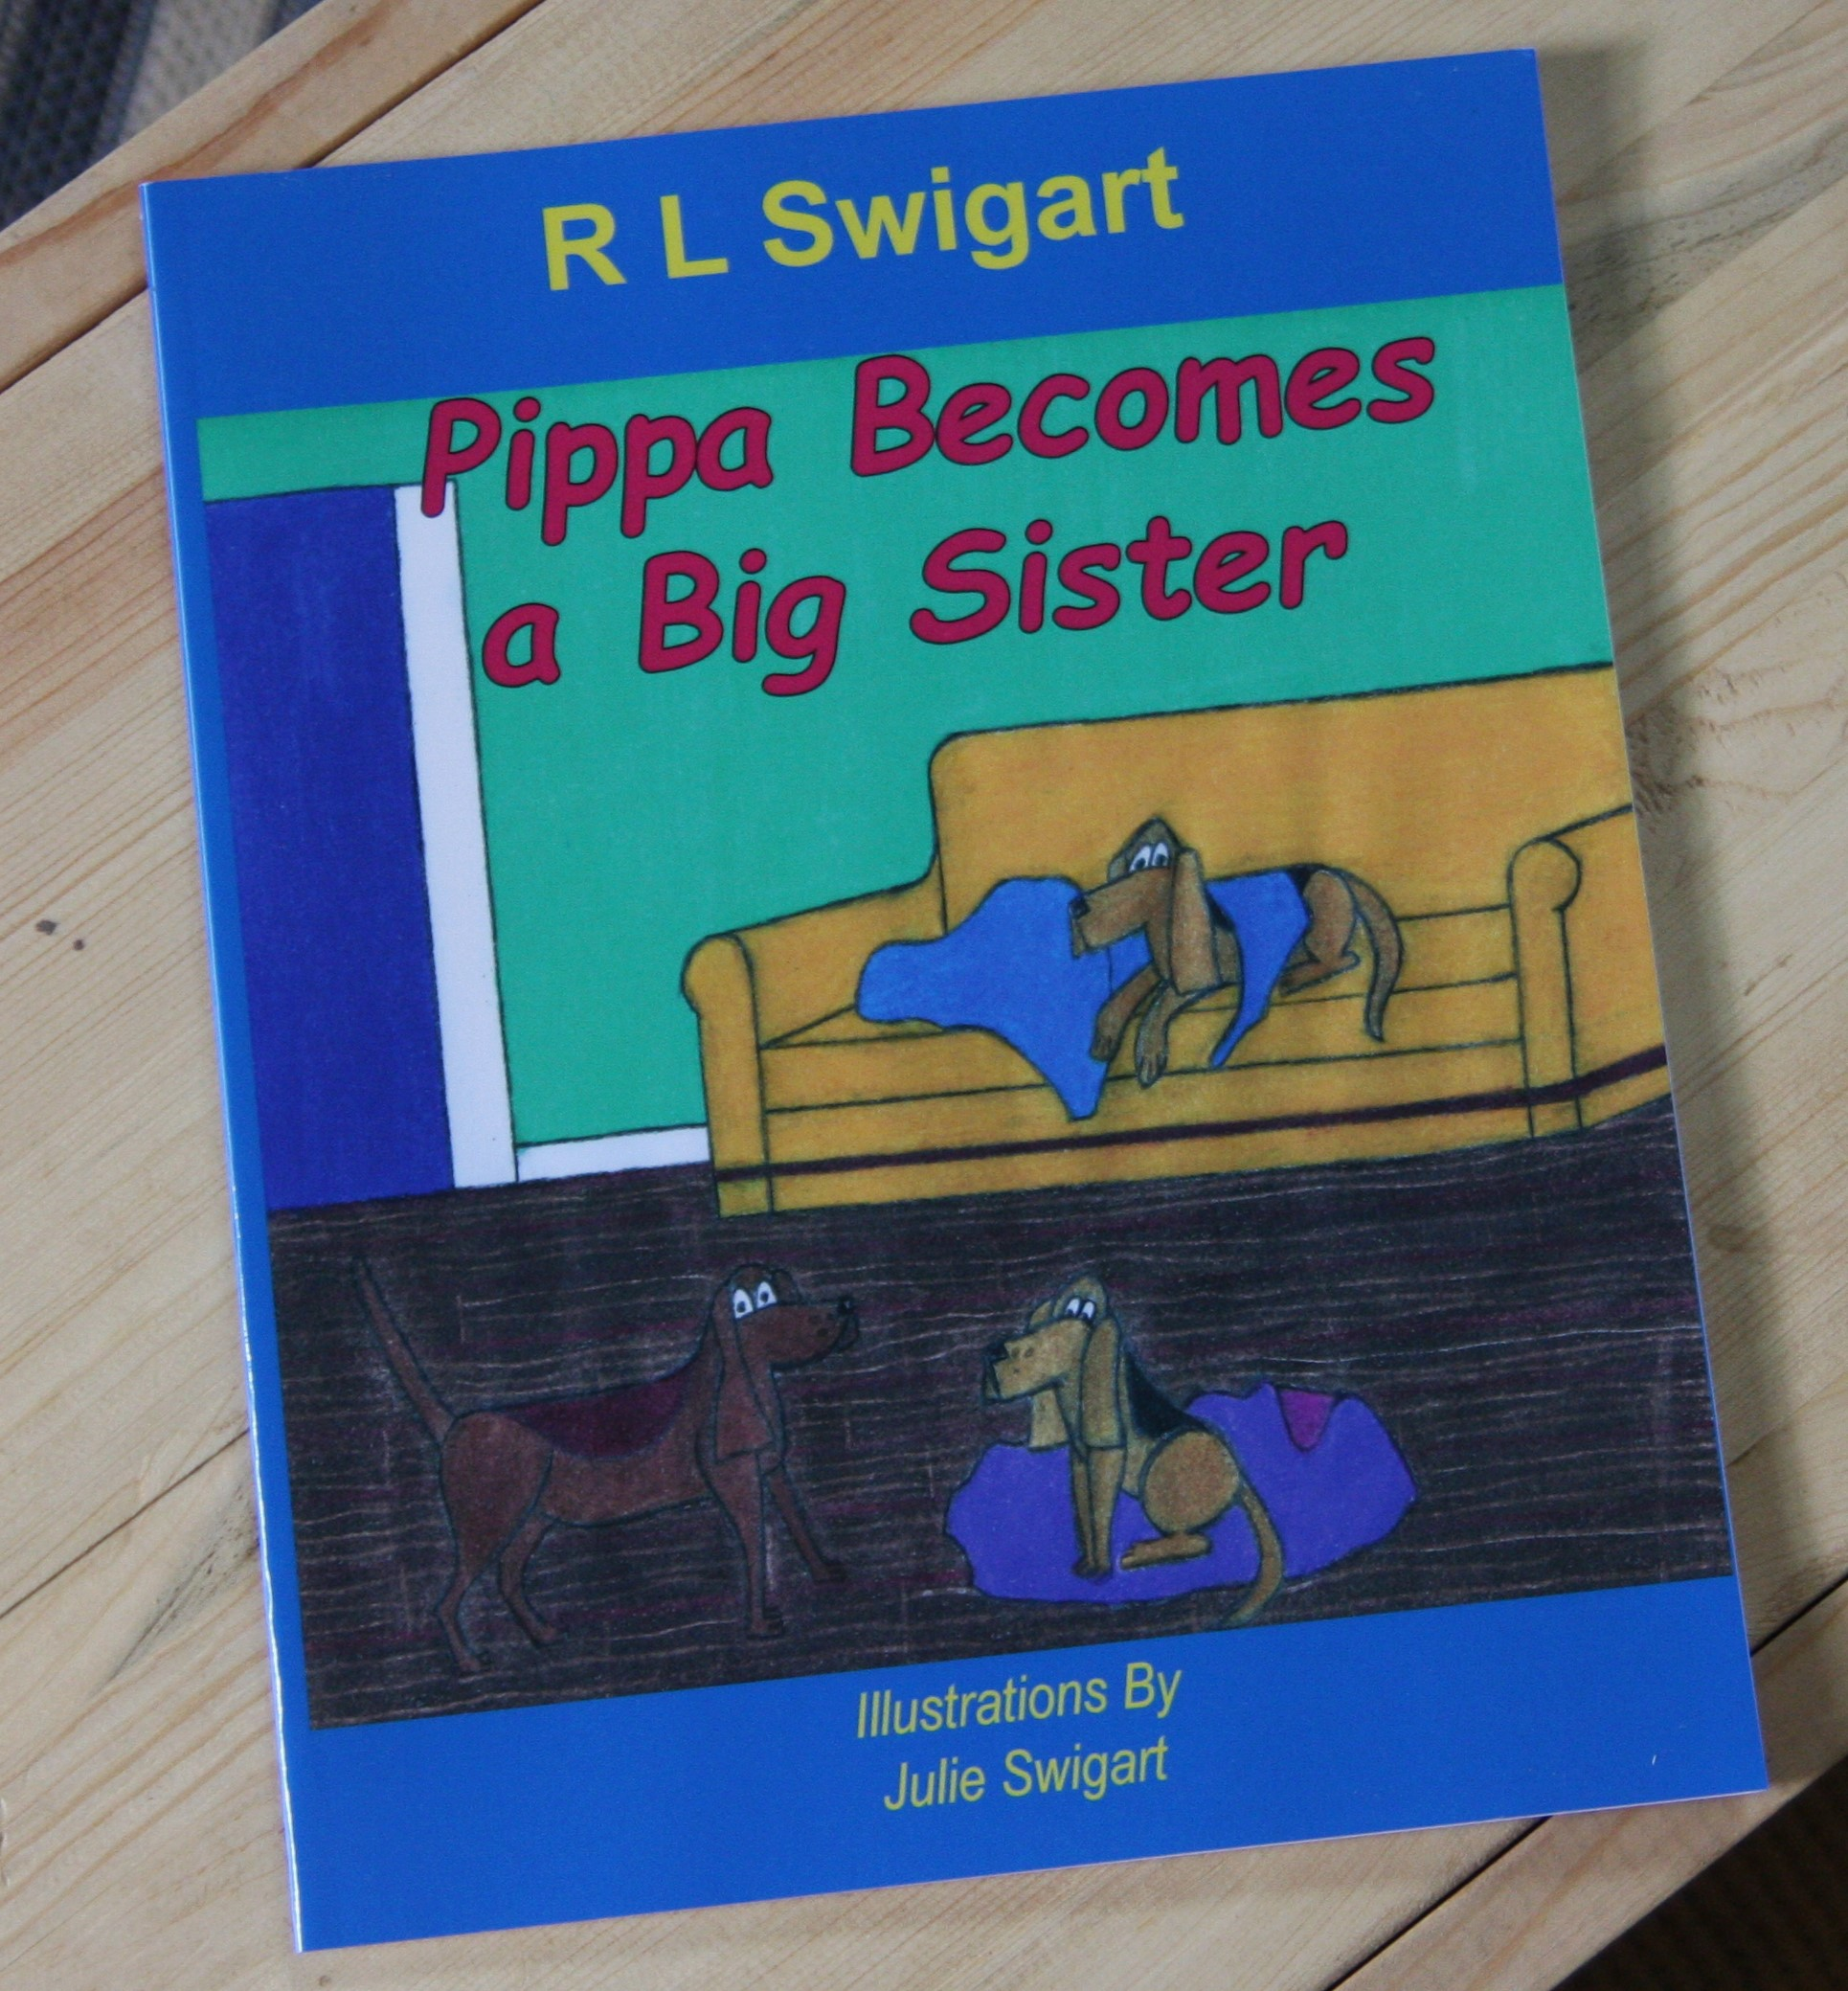 Pippa Becomes a Big Sister